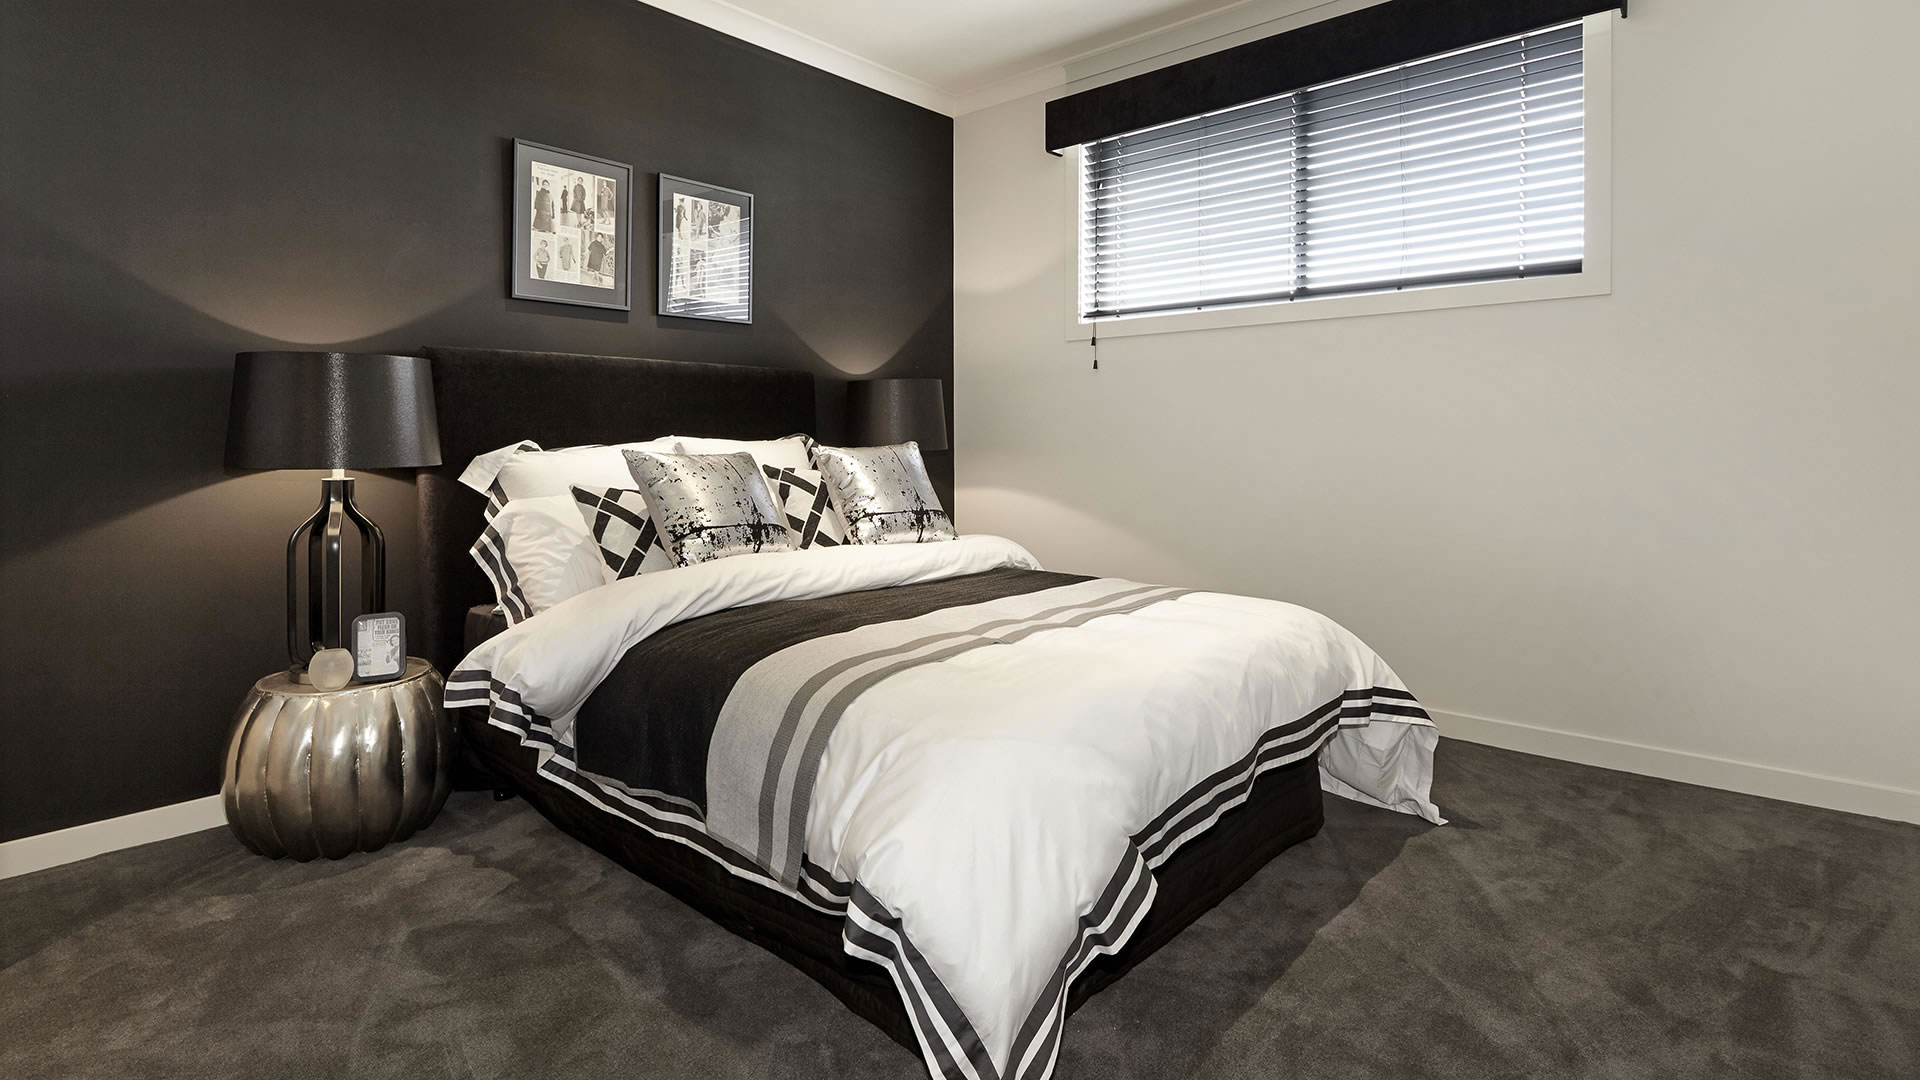 Bedroom Designs Grey CarpetVisi Build 3D. Dark grey carpet bedroom ideas